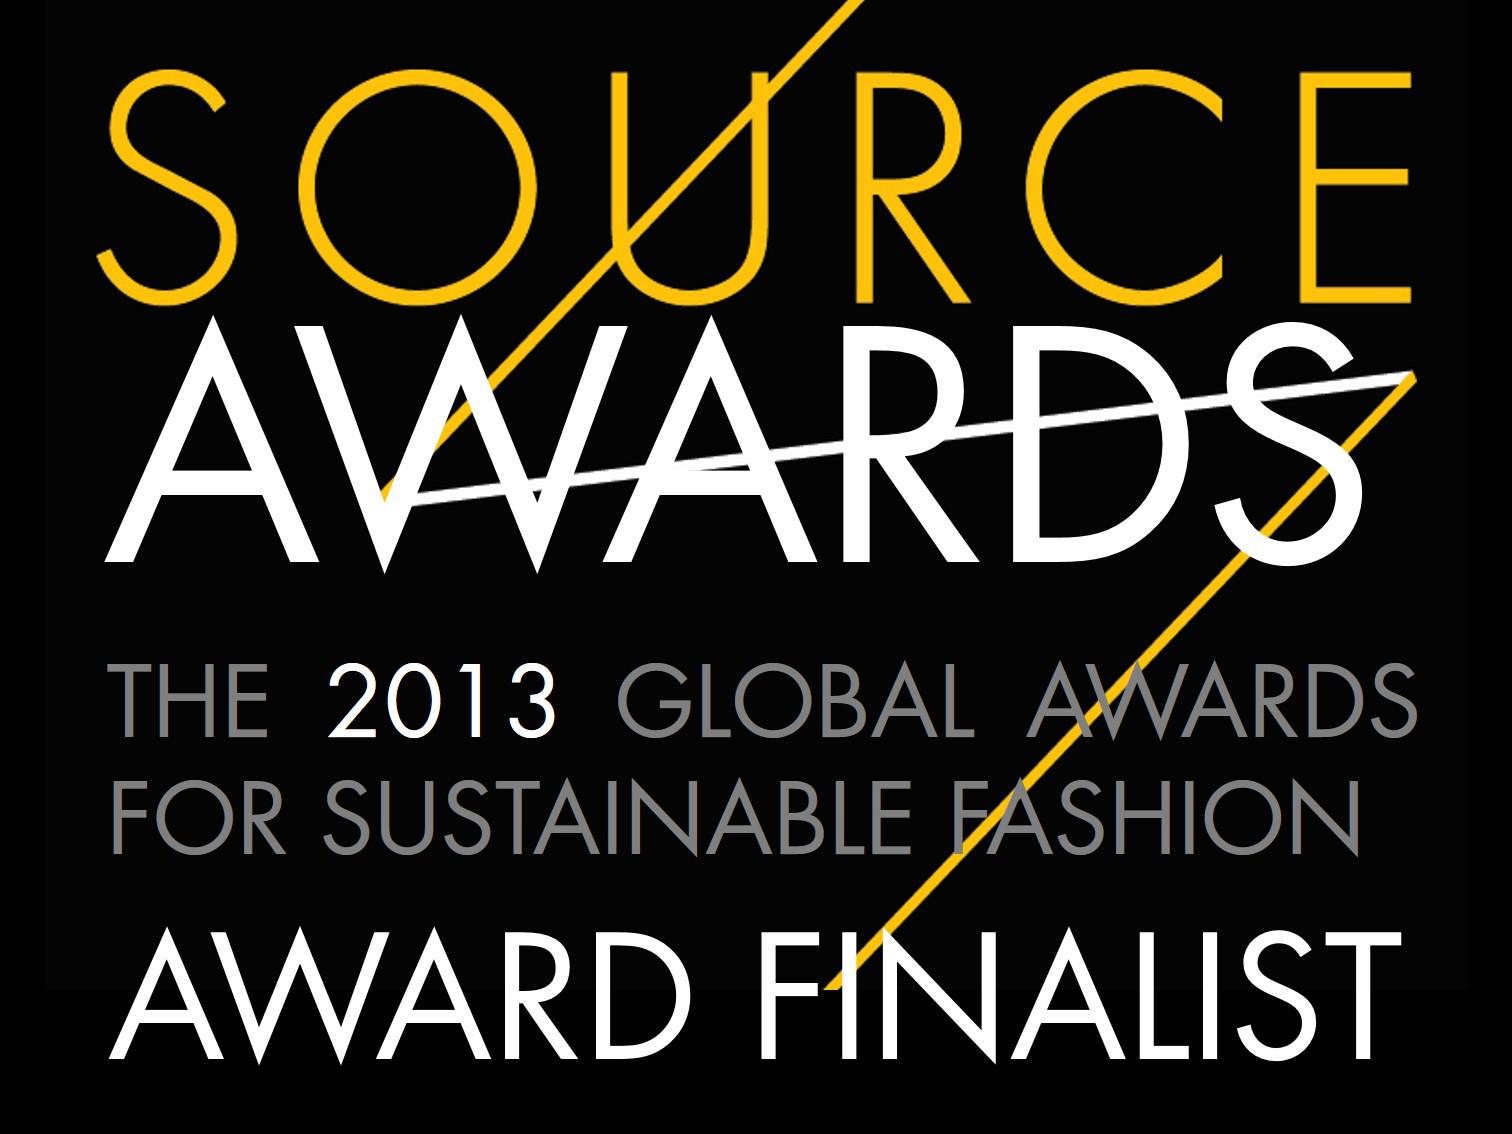 SOURCE-Awards-2013-Finalist-Logo.jpg